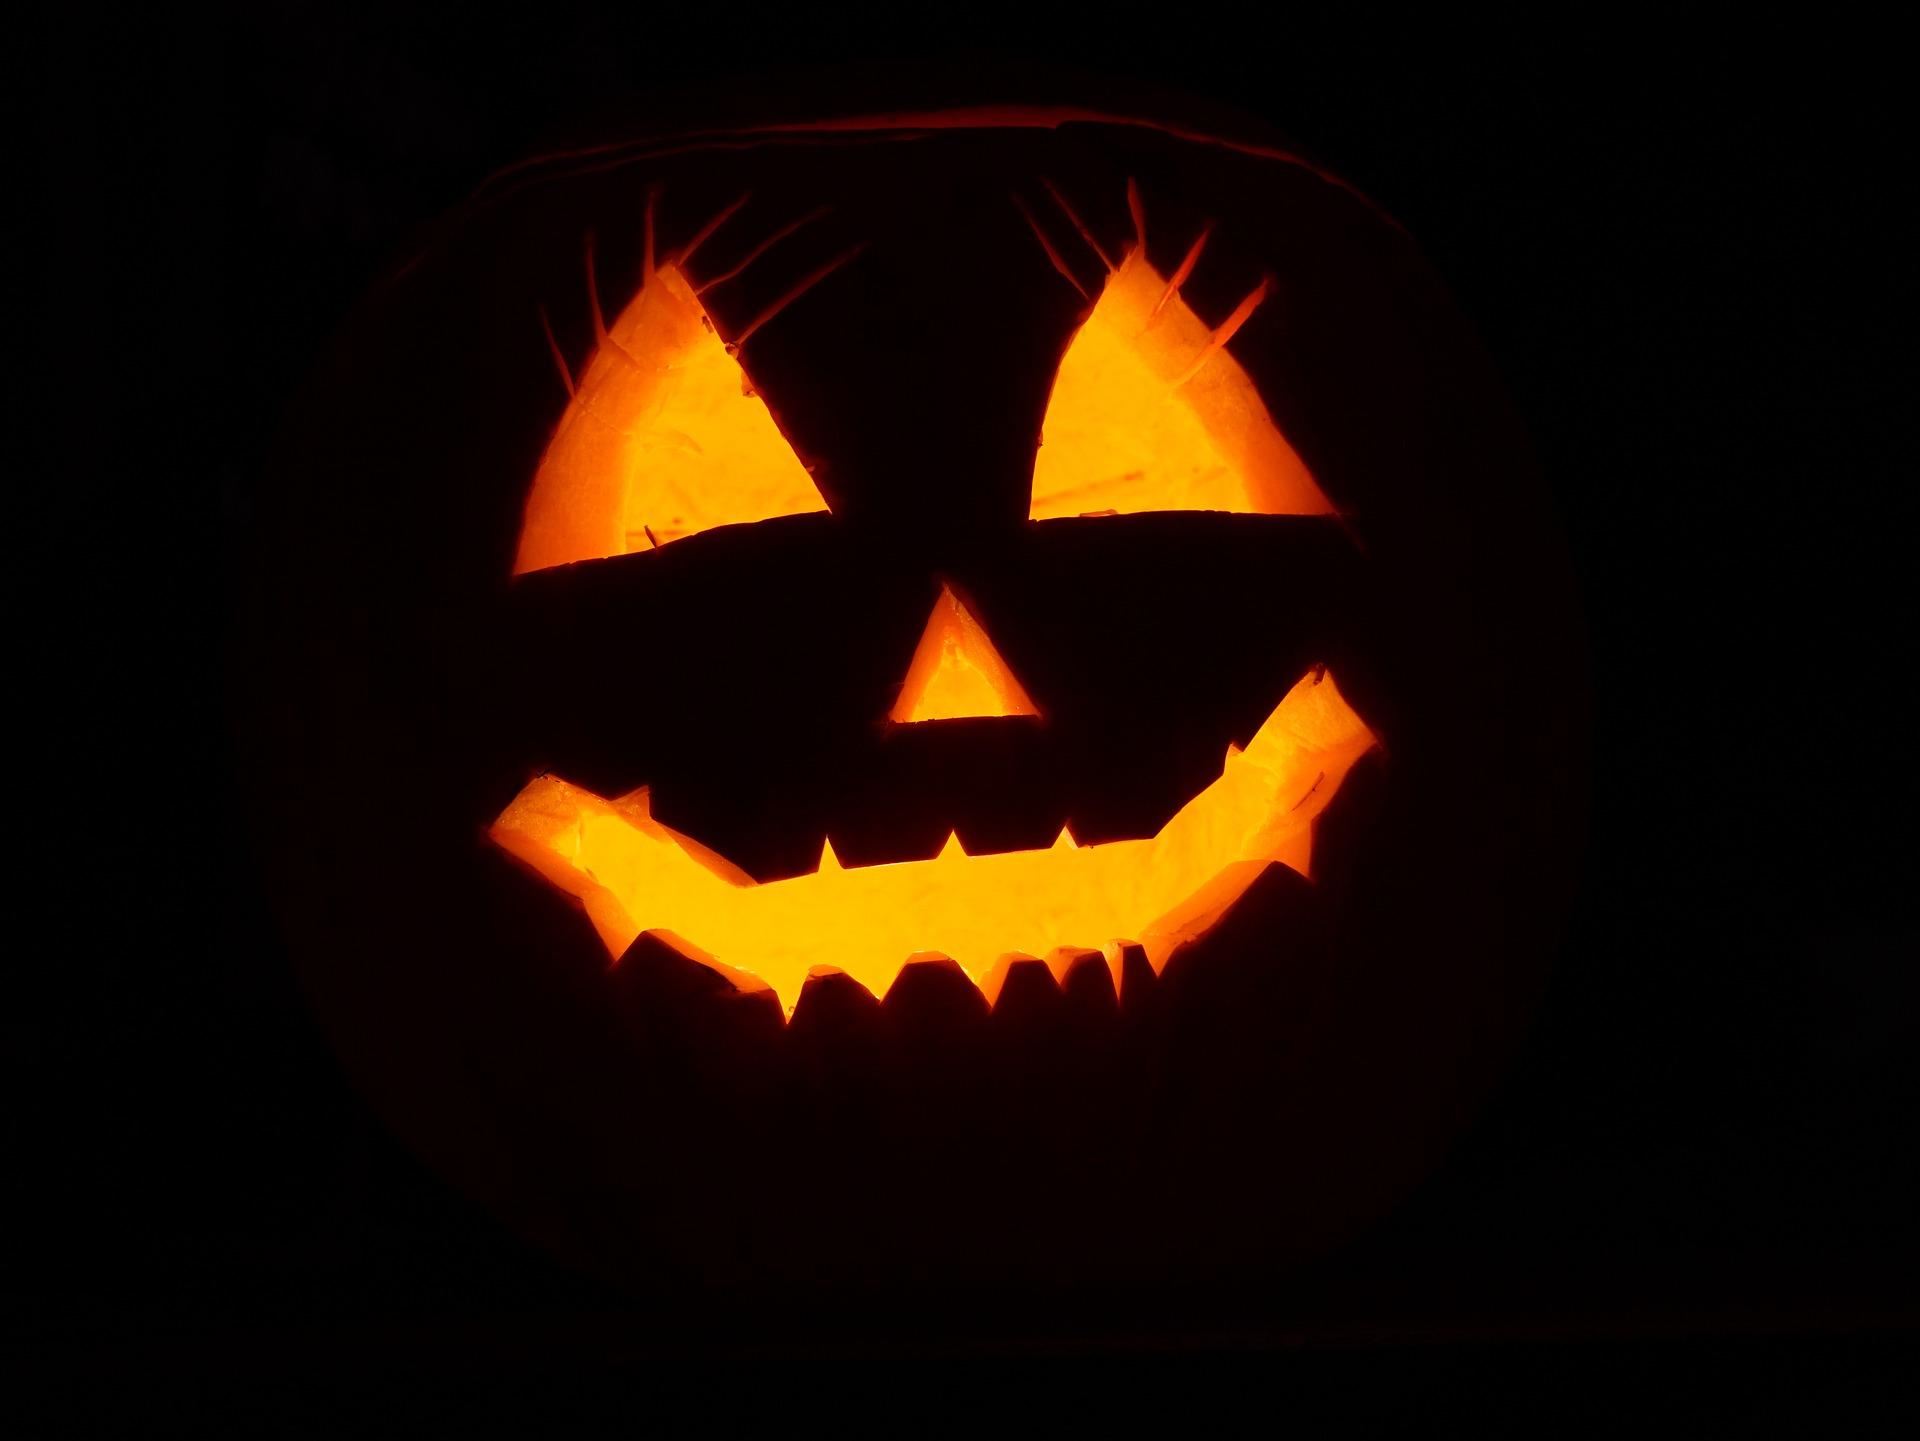 Saturday october 31st - Halloween